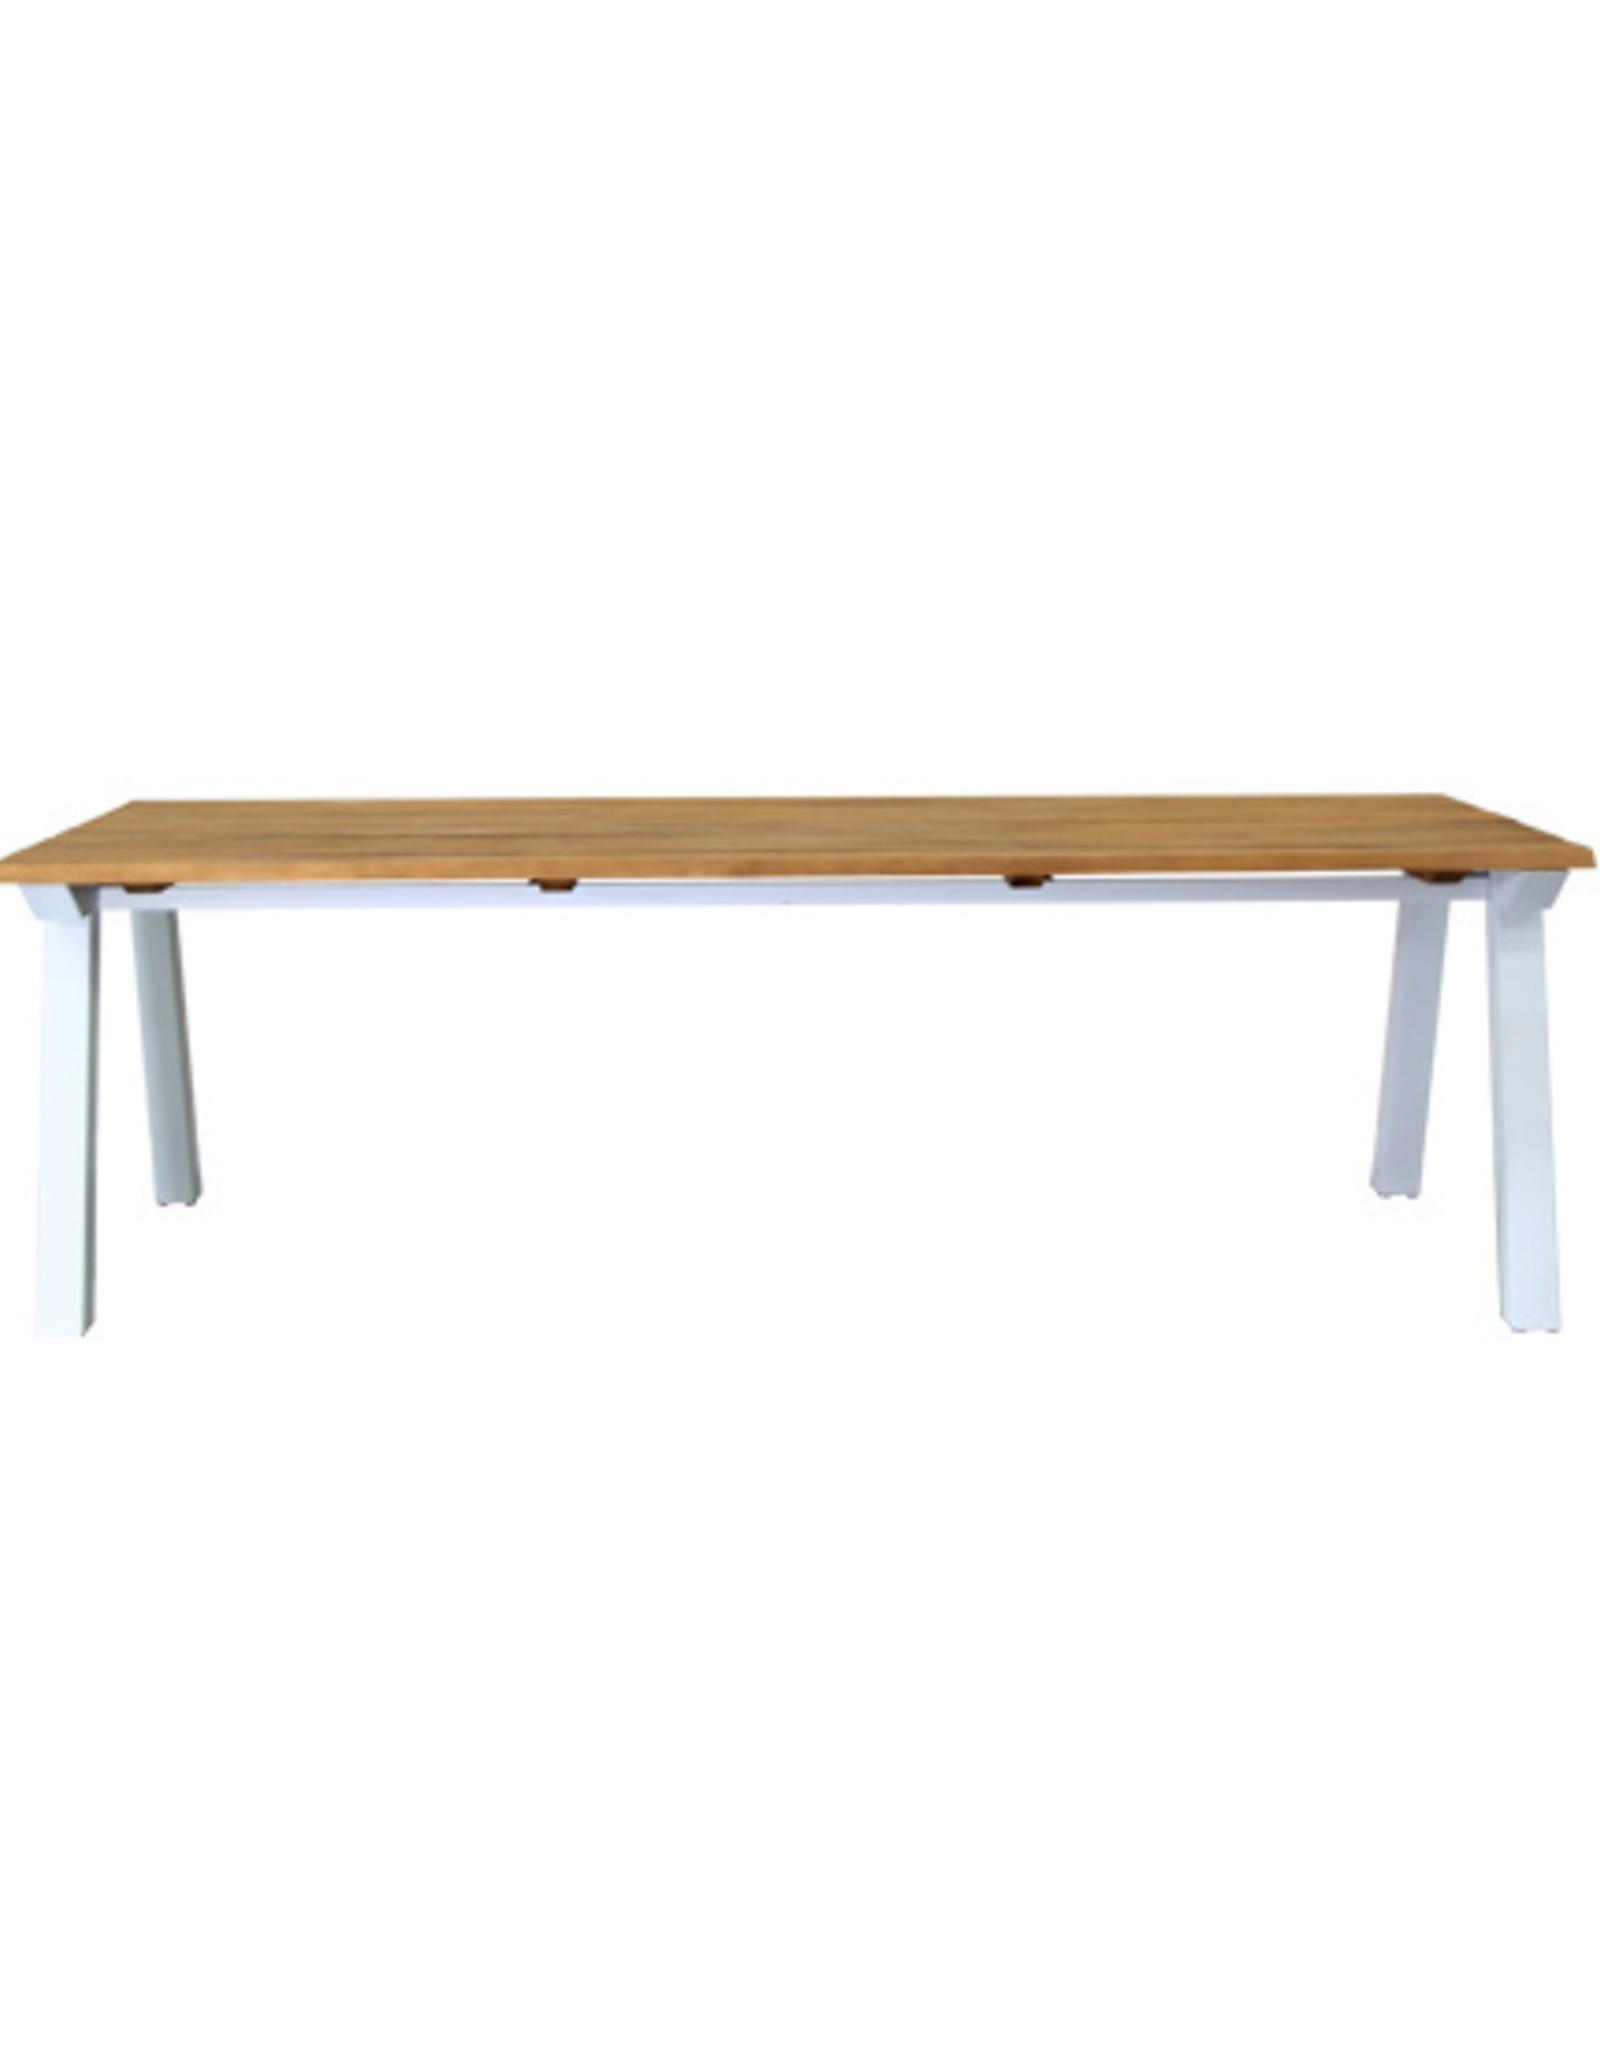 SATARA Eden dining table